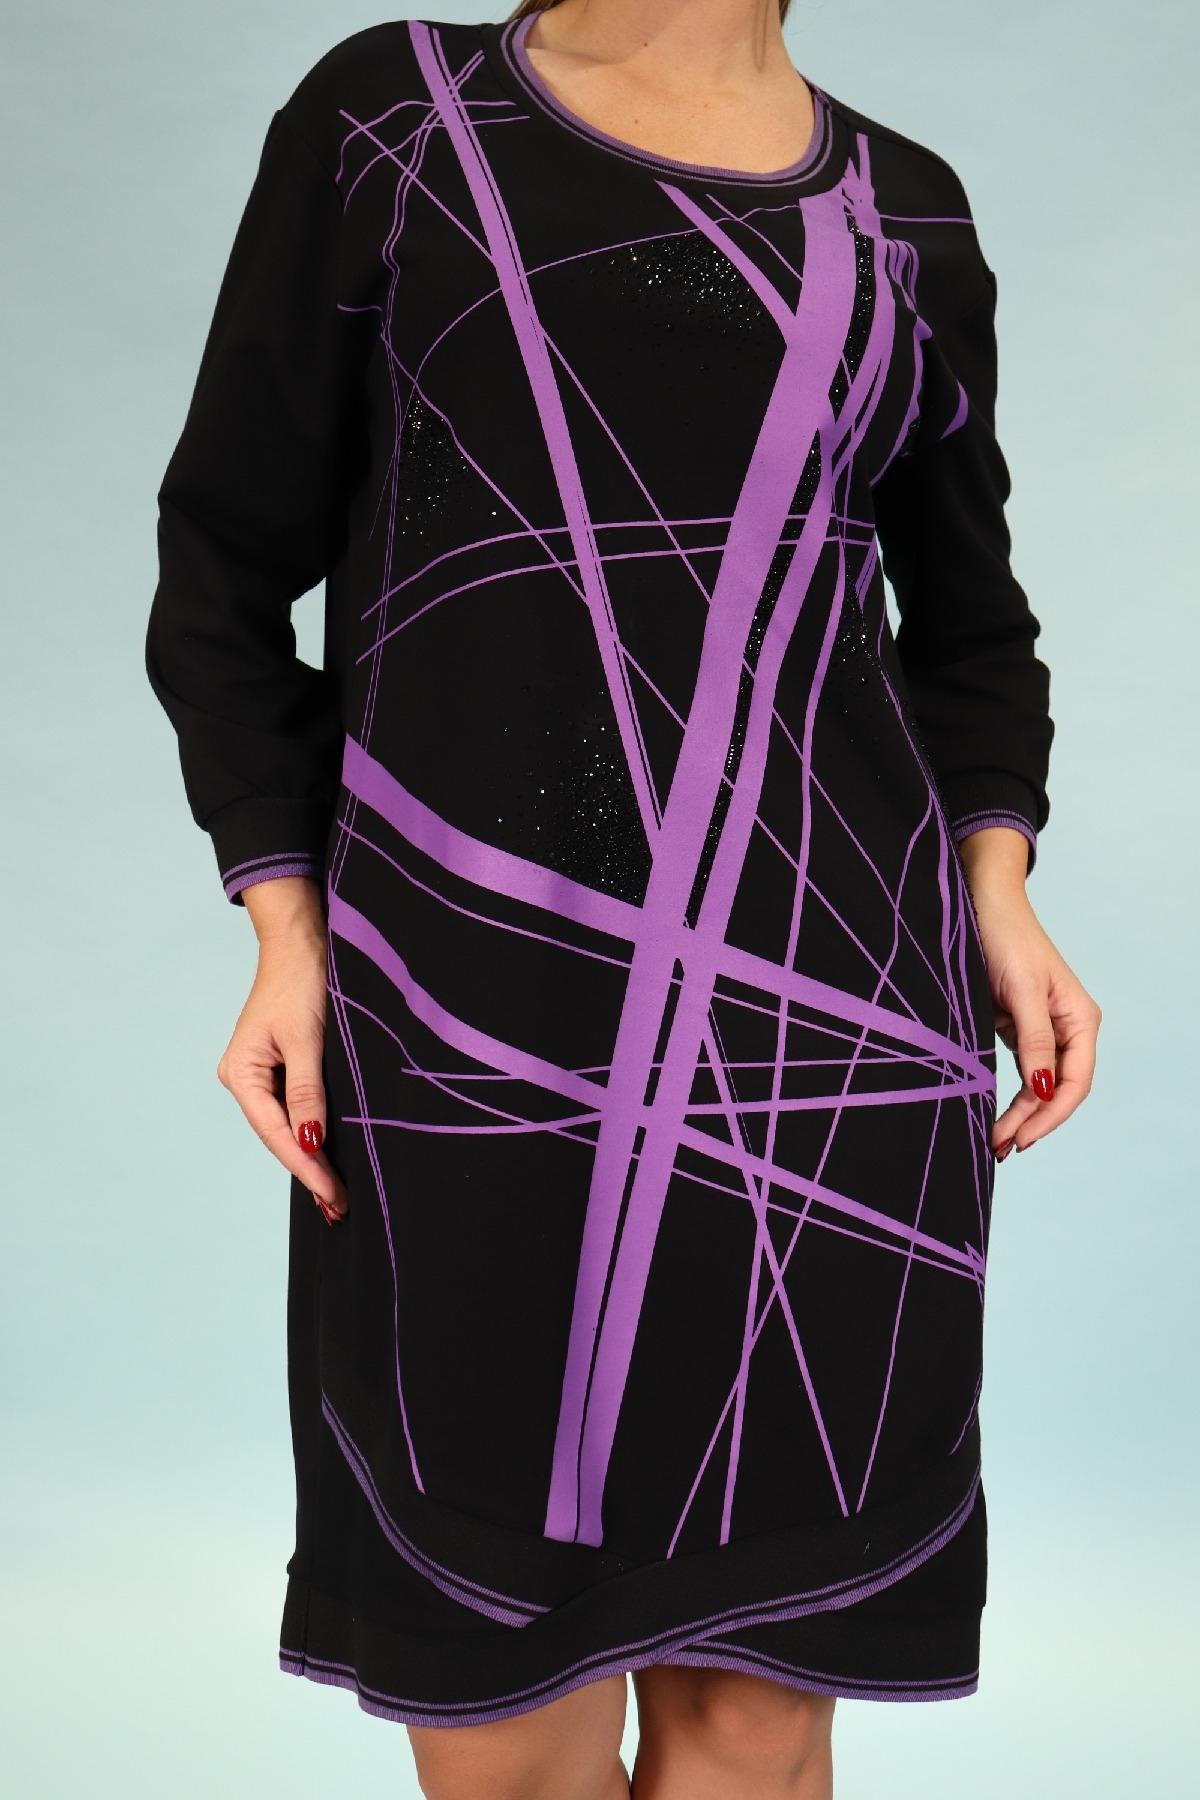 Day Dresses Medium-Lilac